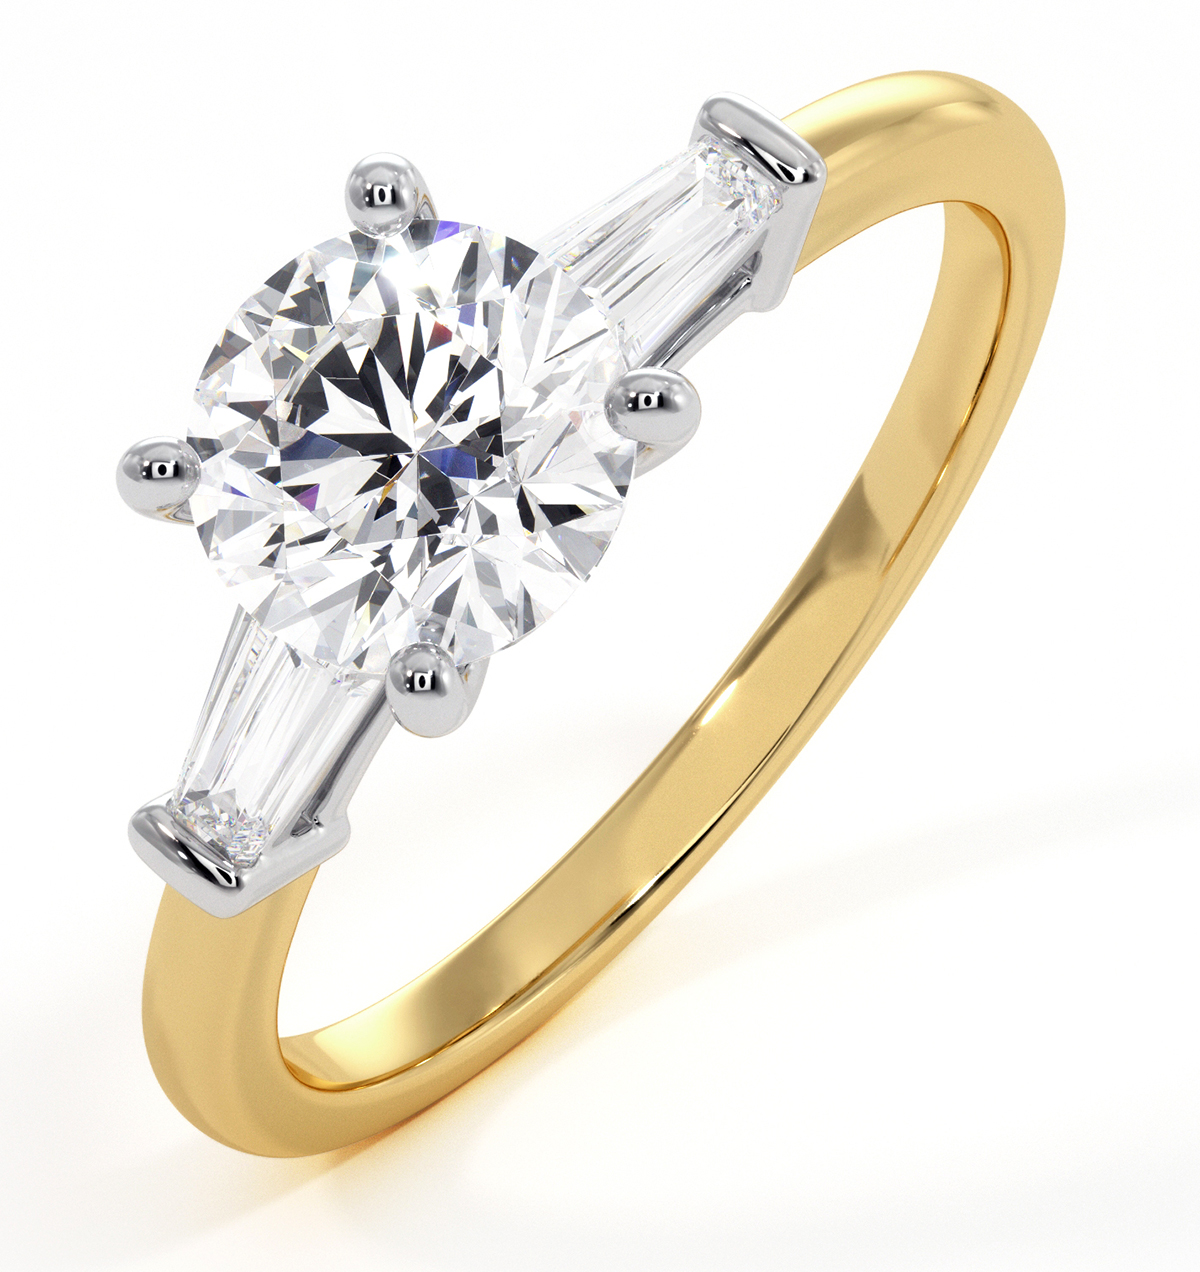 Isadora GIA Diamond Engagement Ring 18KY 1.10ct G/SI1 - image 1